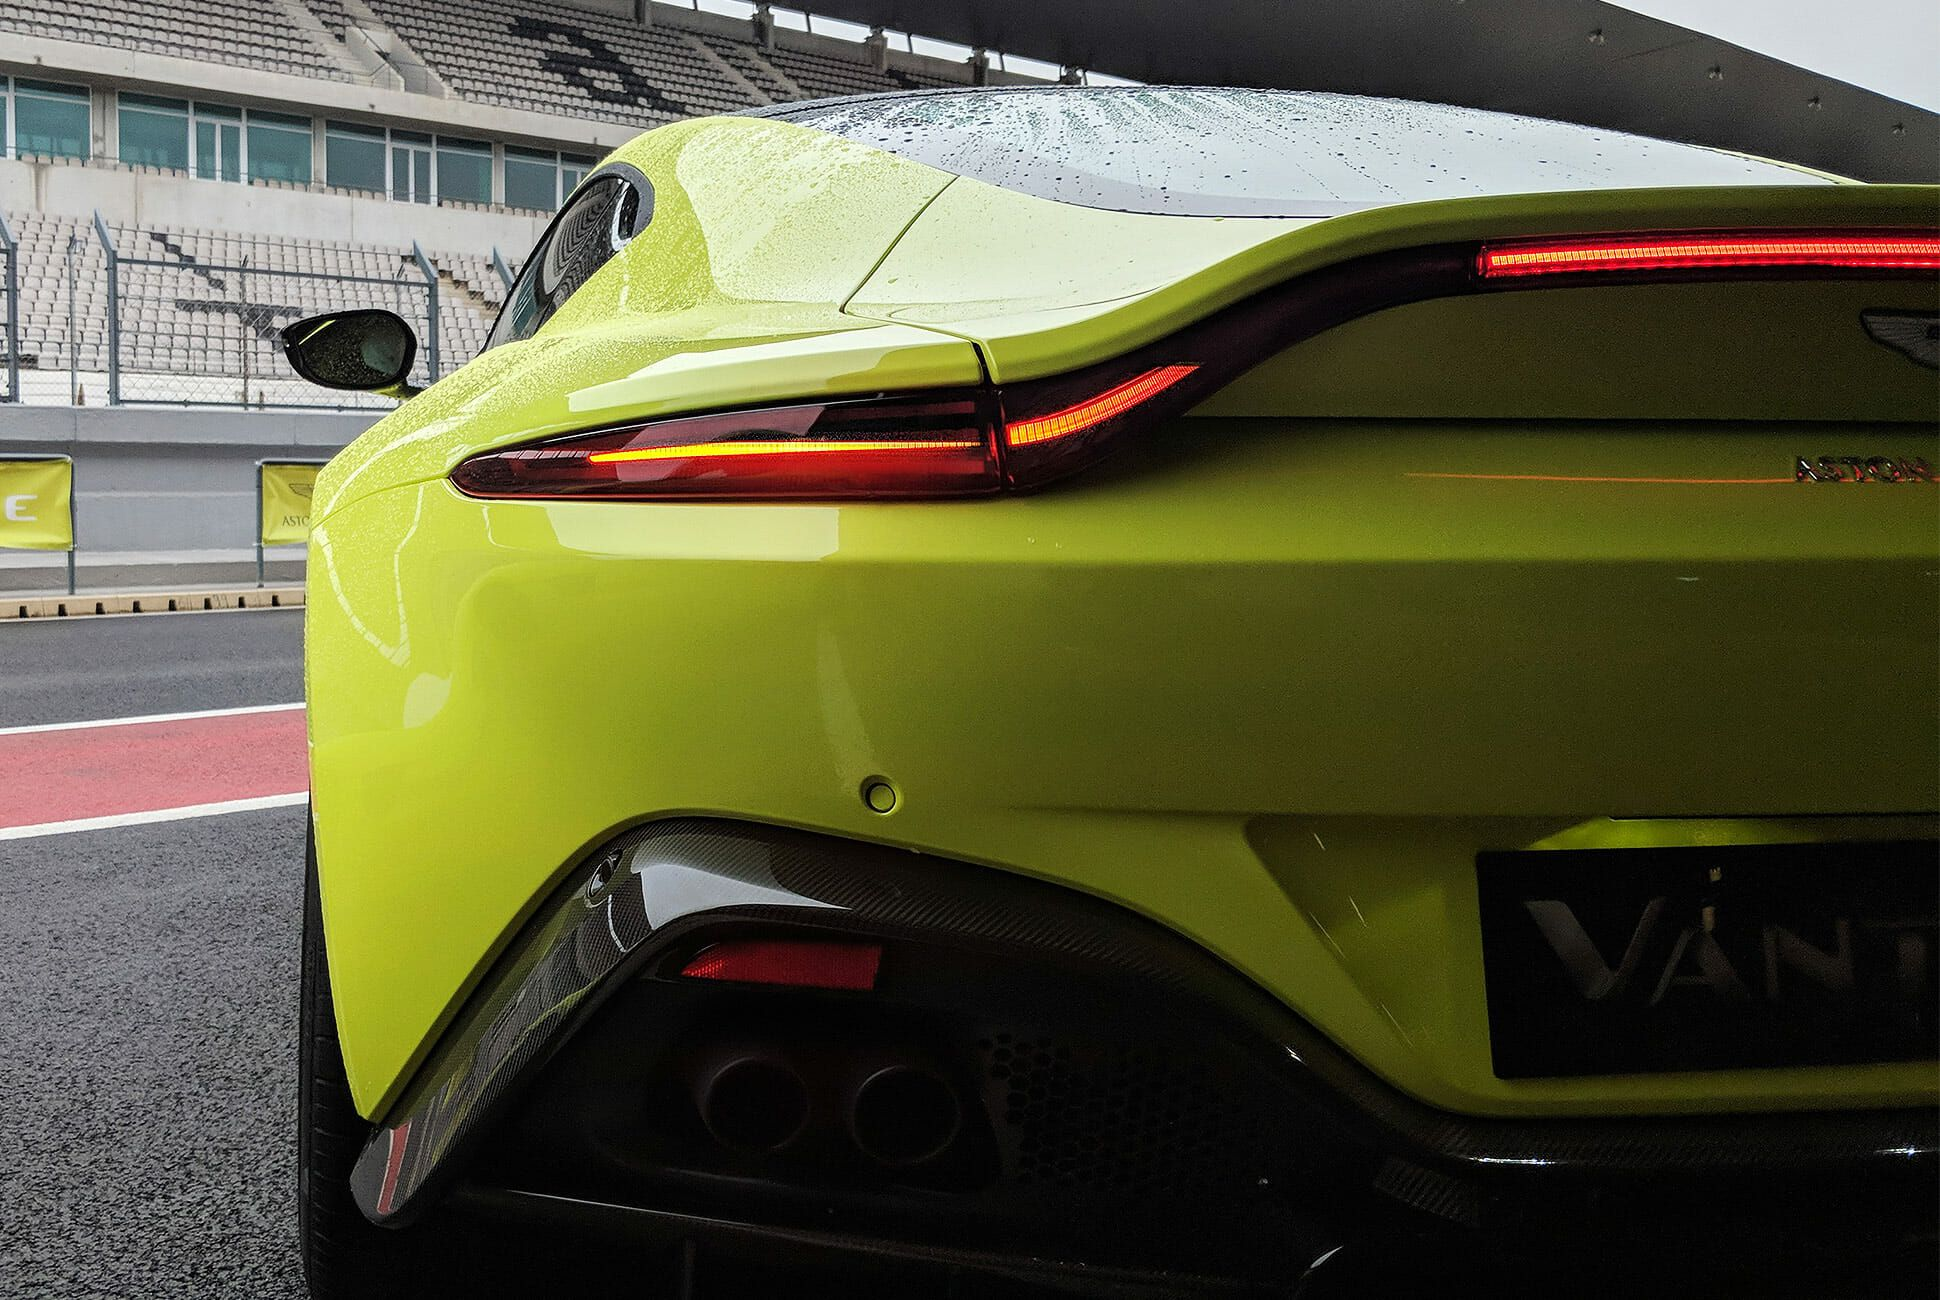 Aston-Vantage-Review-gear-patrol-slide-2